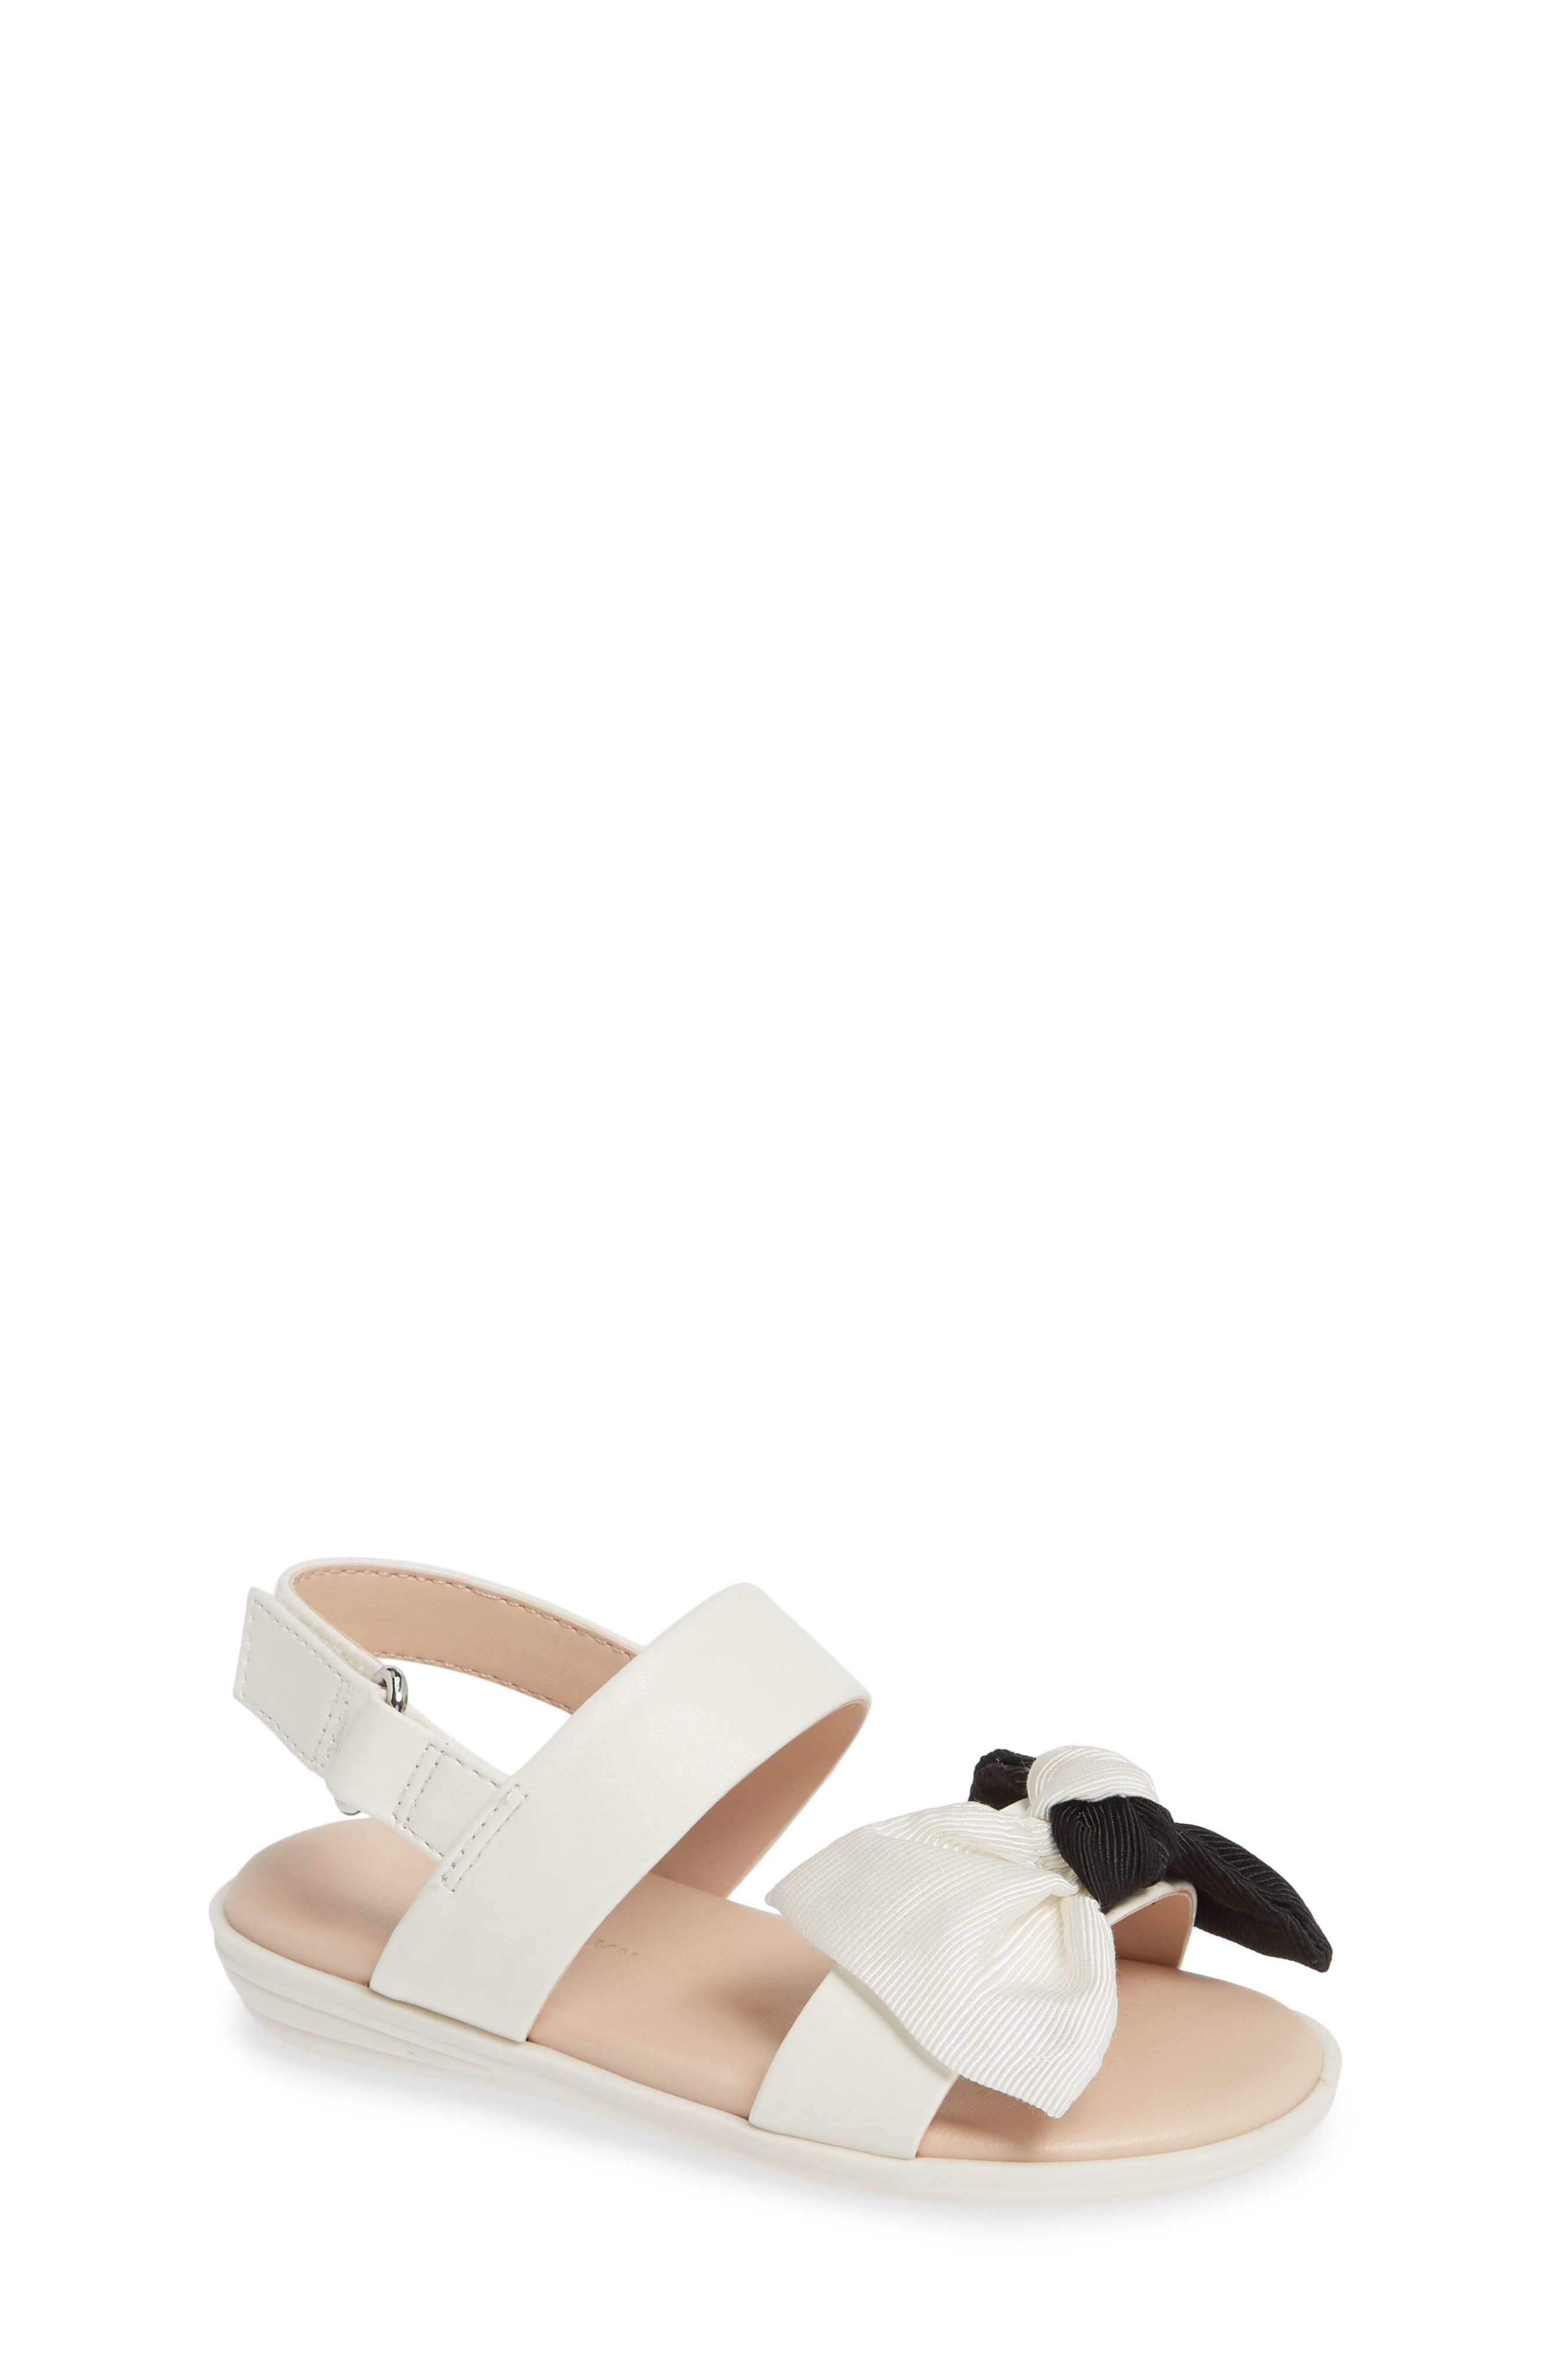 Chelsea Bow Sandal, Main, color, WHITE/BLACK FAUX LEATHER